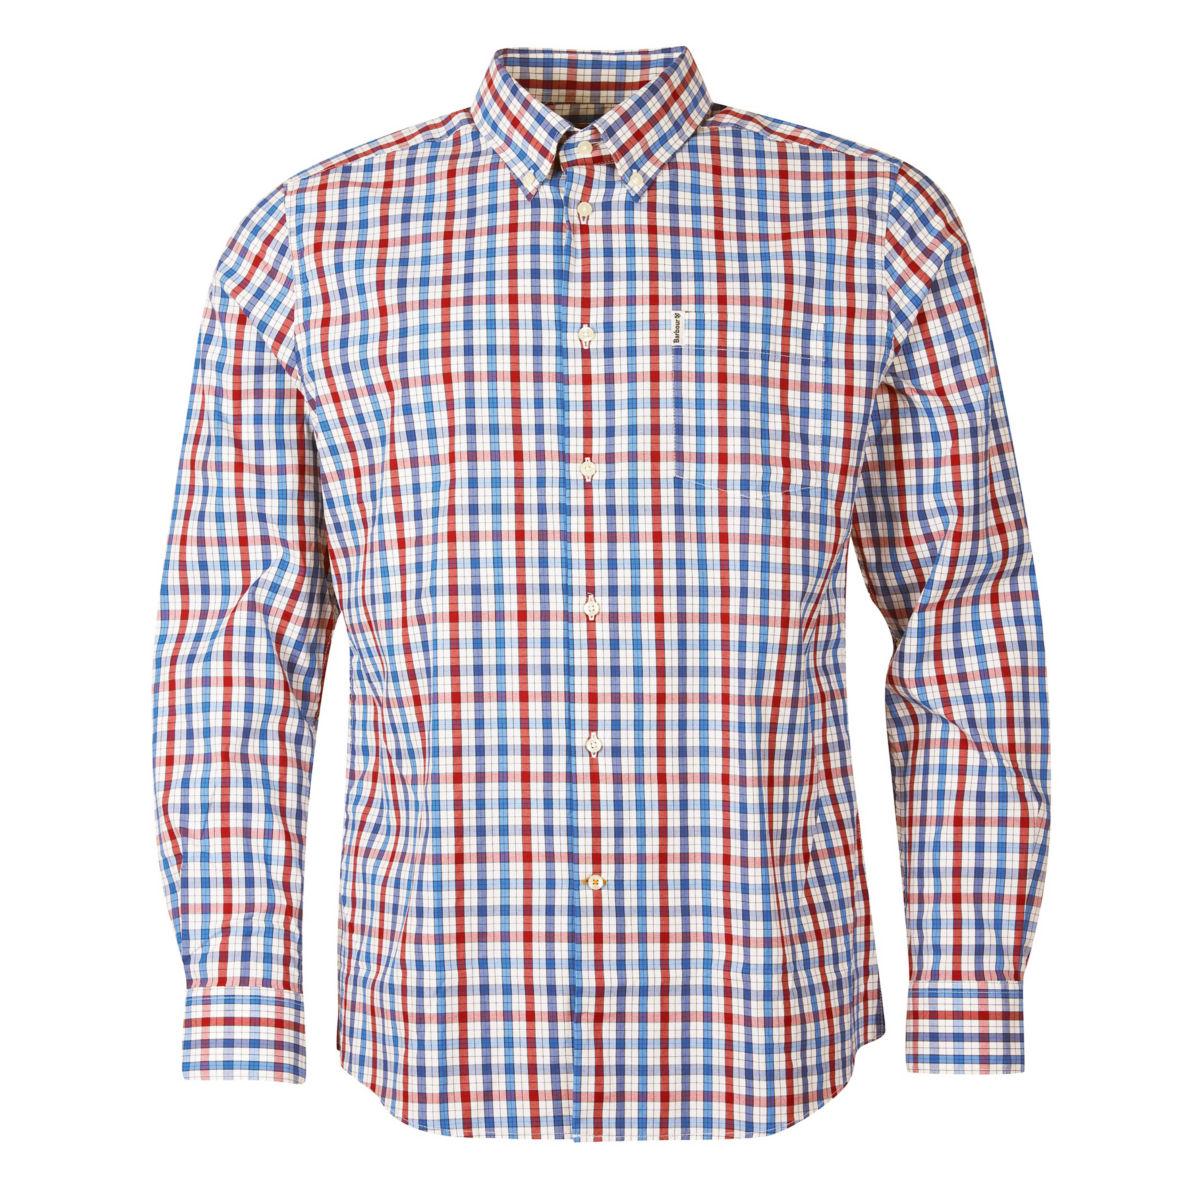 Barbour® Hallhill Performance Shirt - REDimage number 0